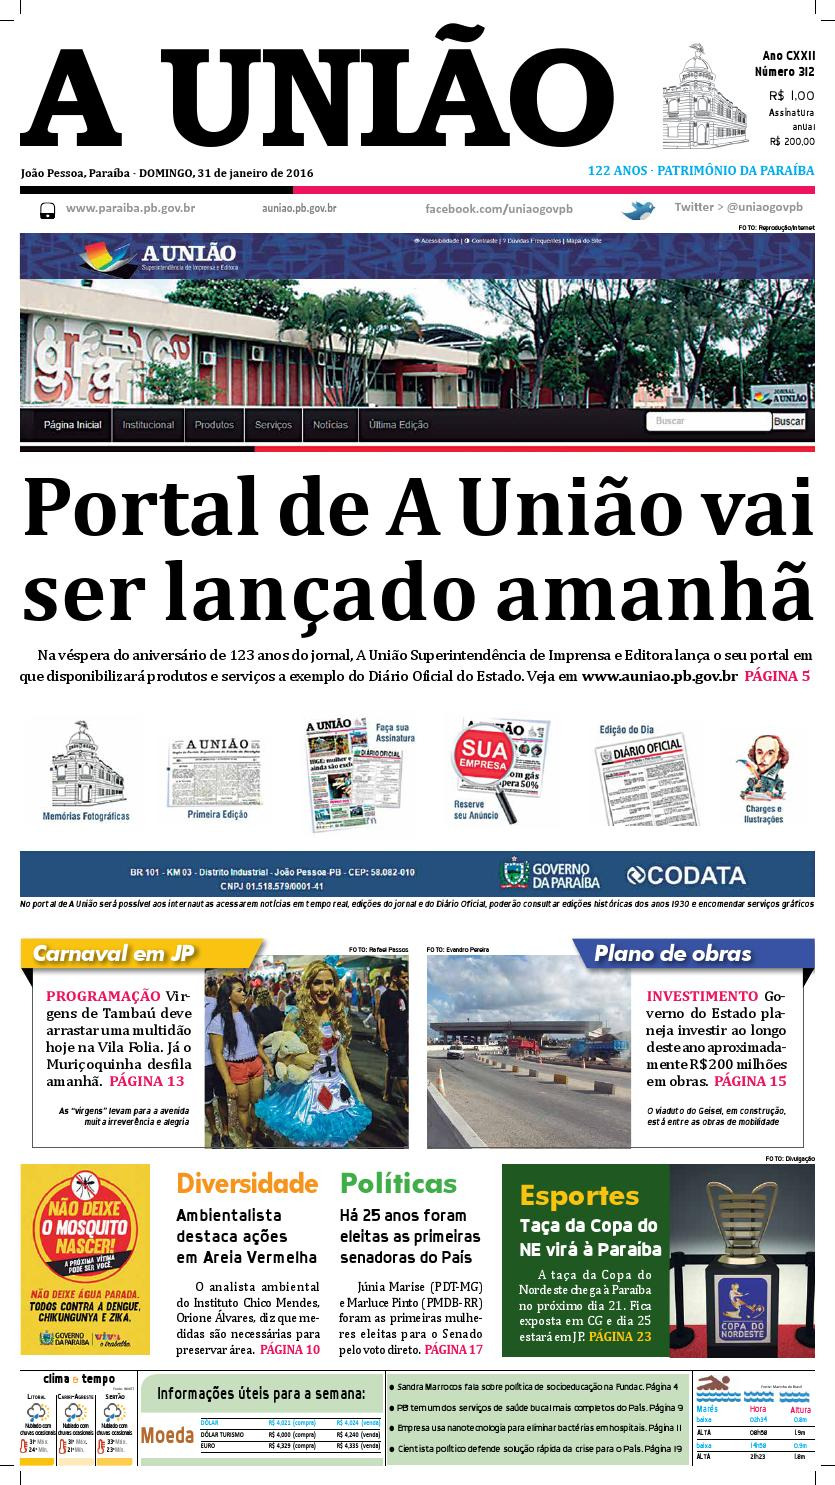 Jornal A União 31 01 16 by Jornal A União - issuu 2f7d12c1bf8c1